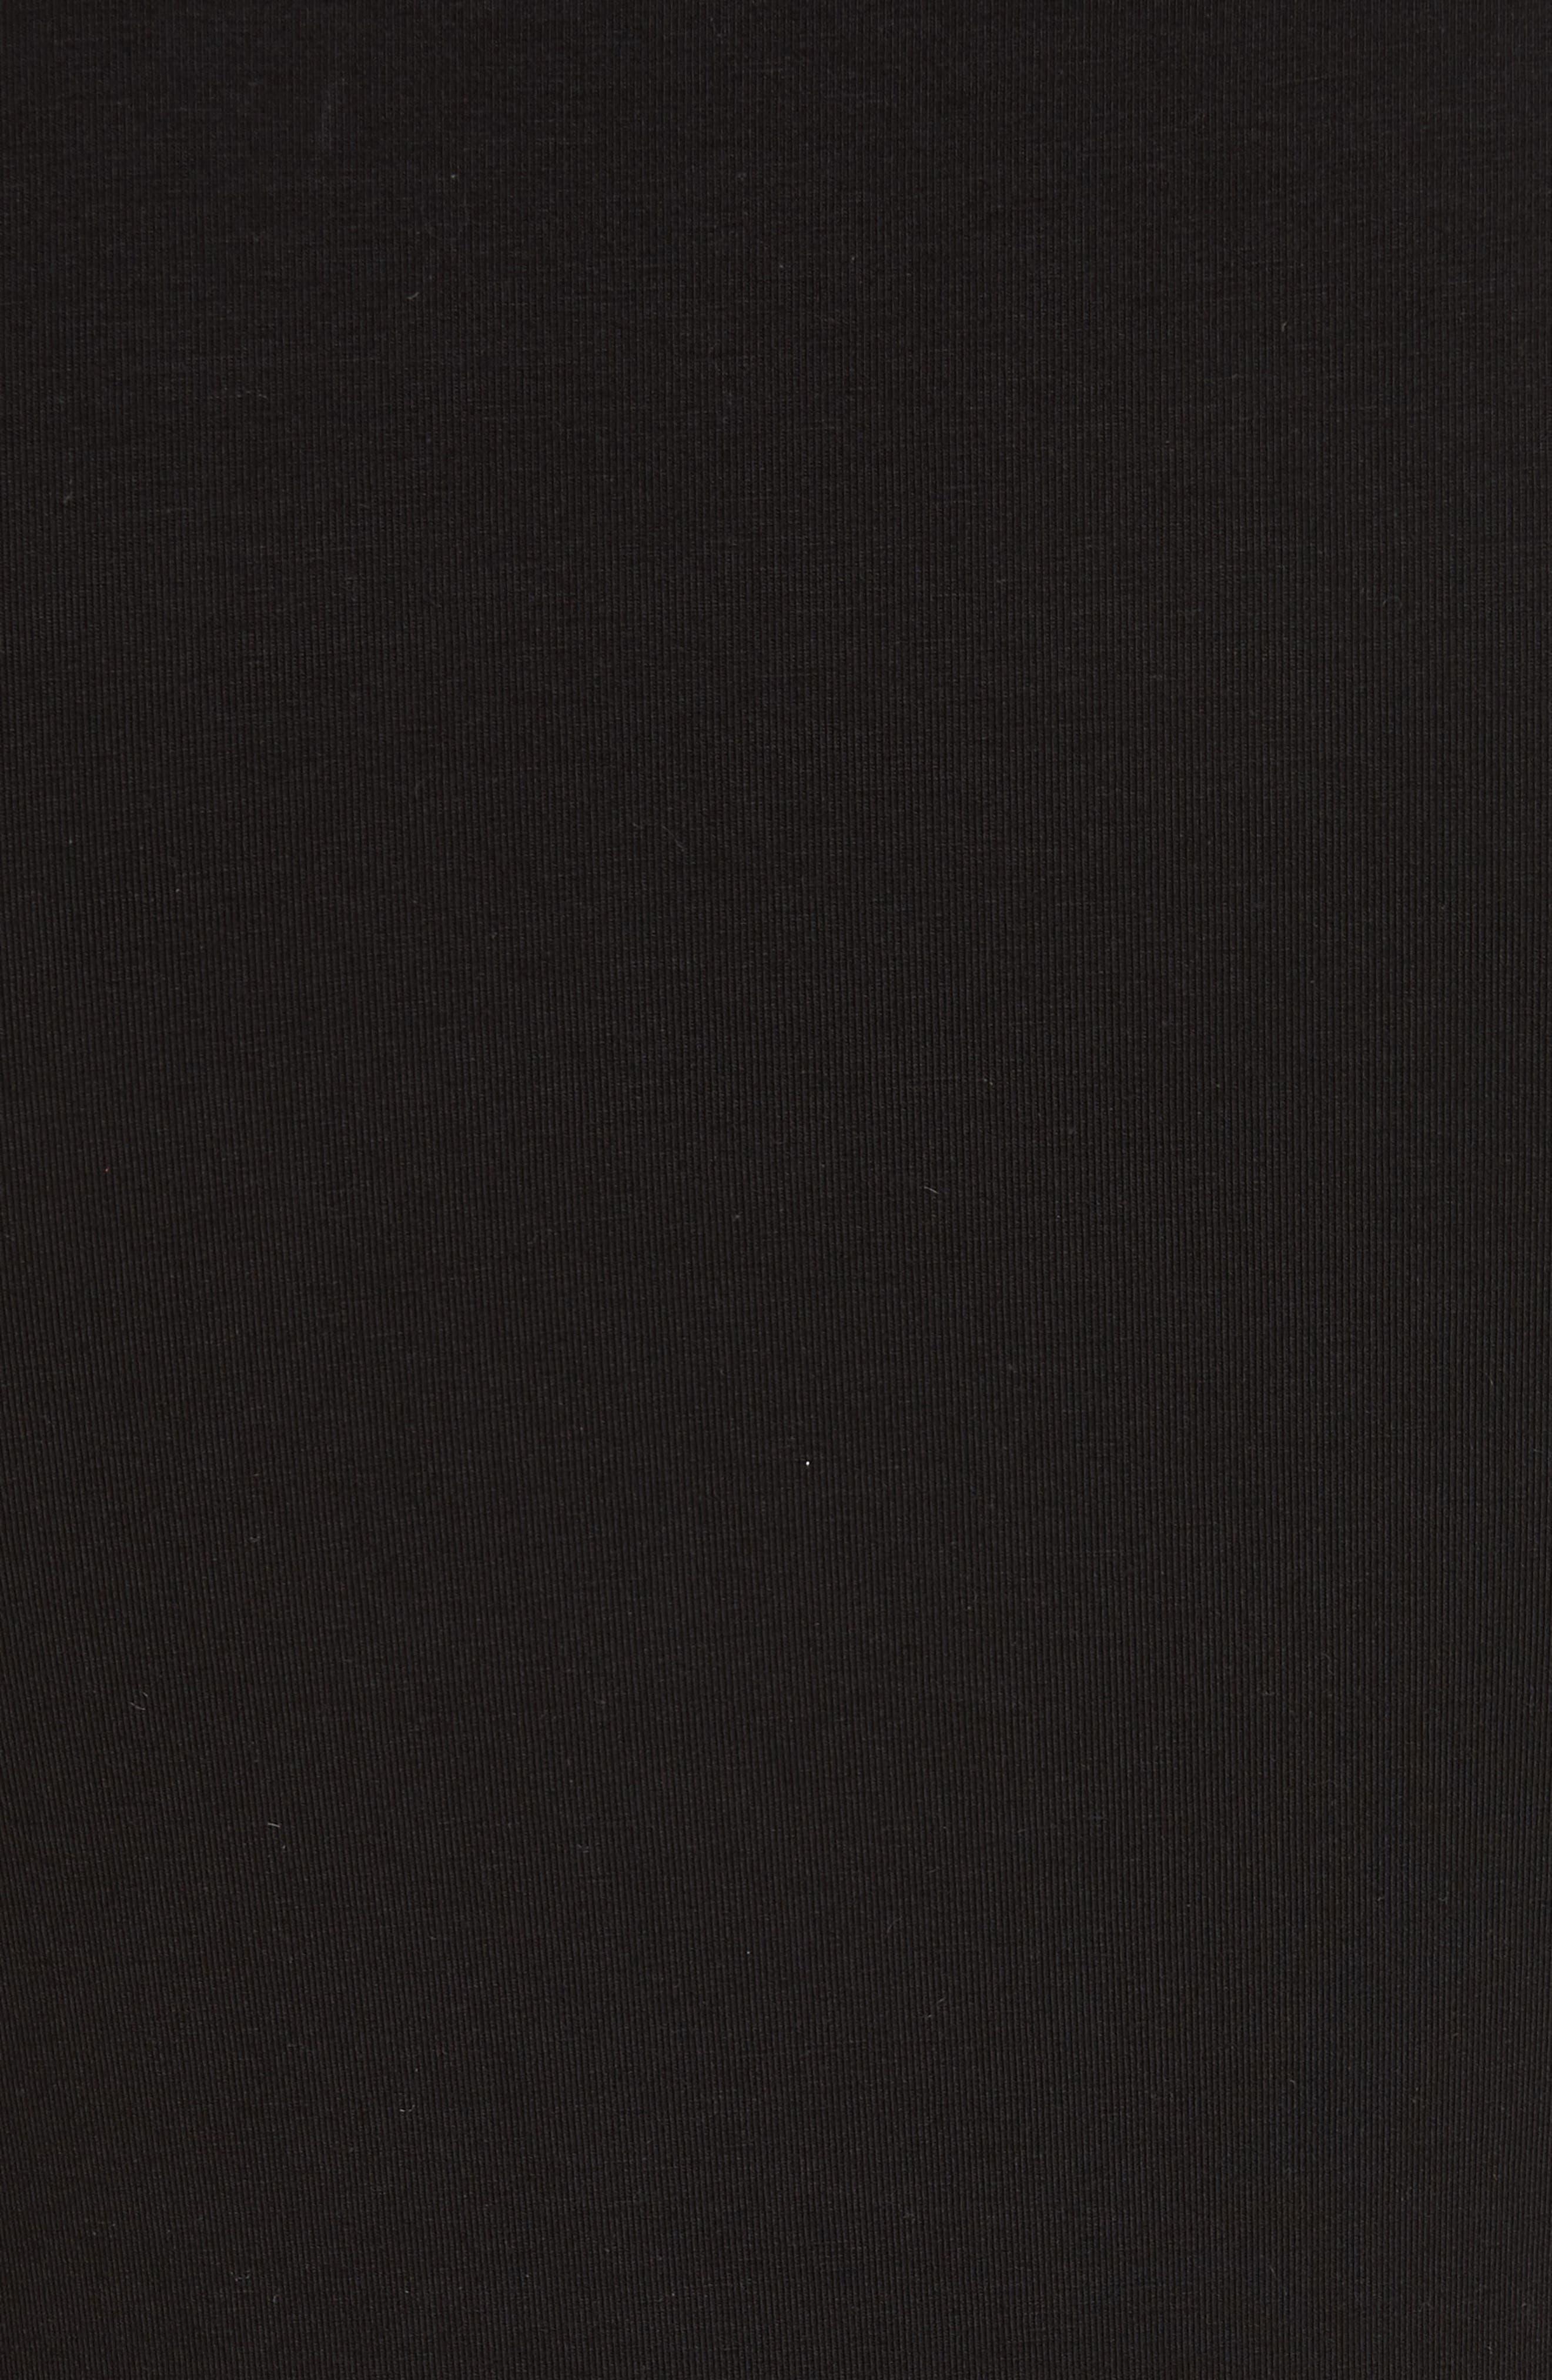 Stretch Pima Cotton Baby Tee,                             Alternate thumbnail 5, color,                             Black